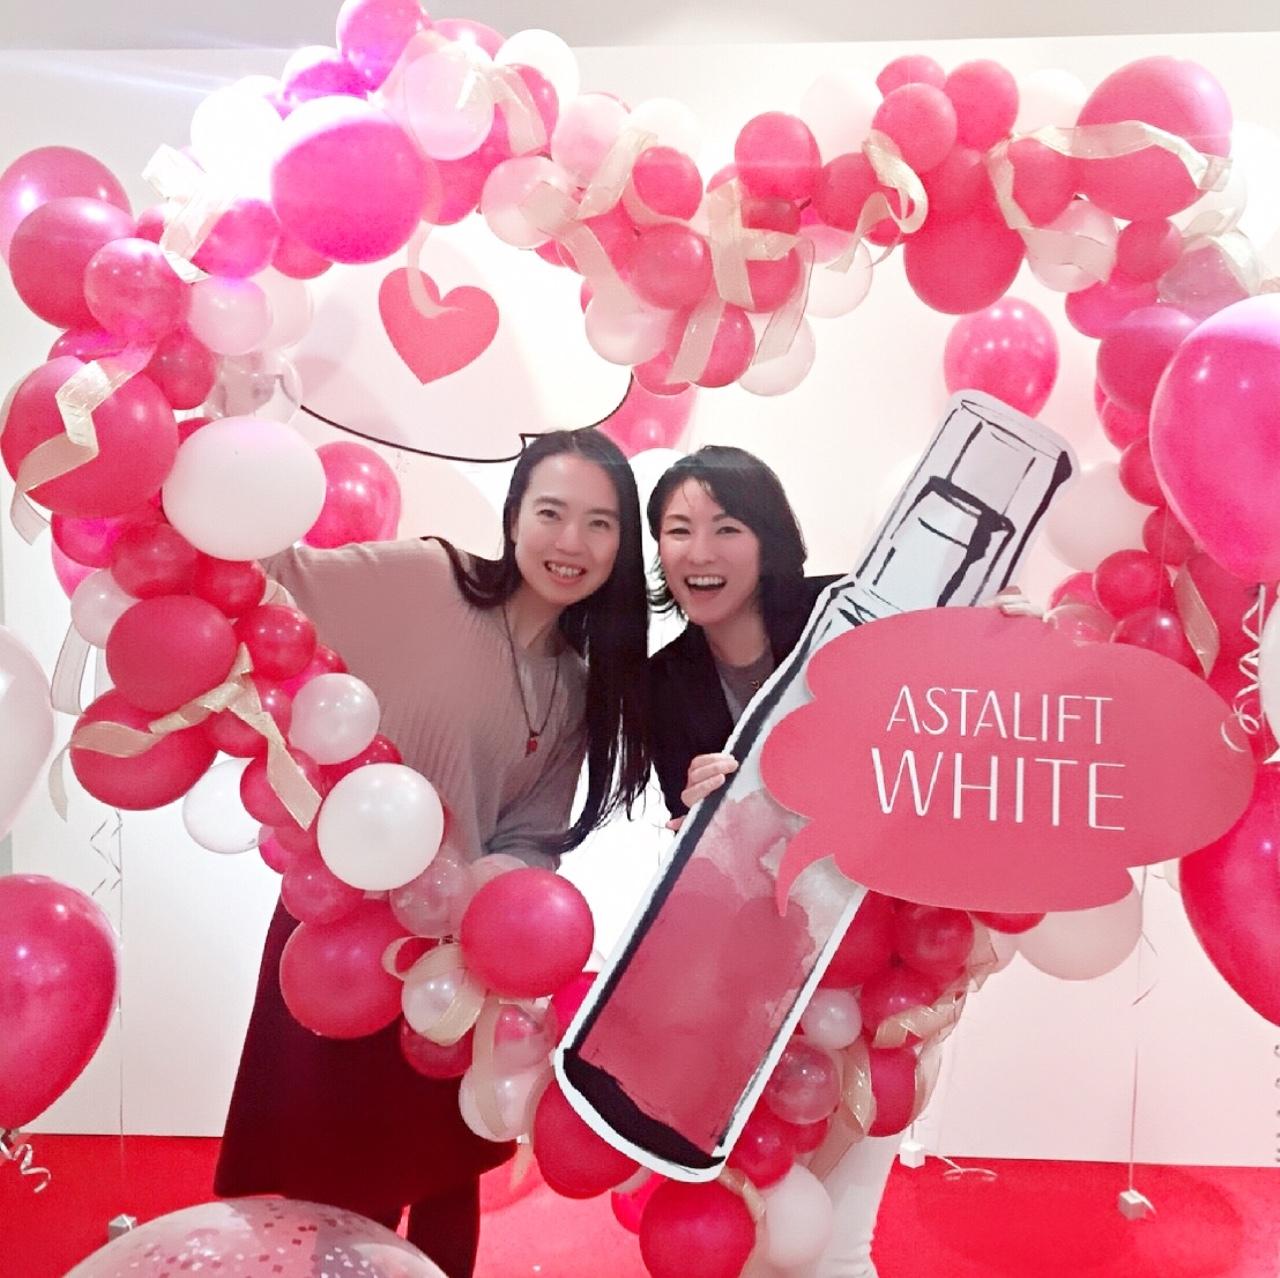 HAPPY VALENTINE ❤︎ バレンタイン・イヴにアスタリフトの新製品先行体験イベントへ行ってきました❤︎_1_1